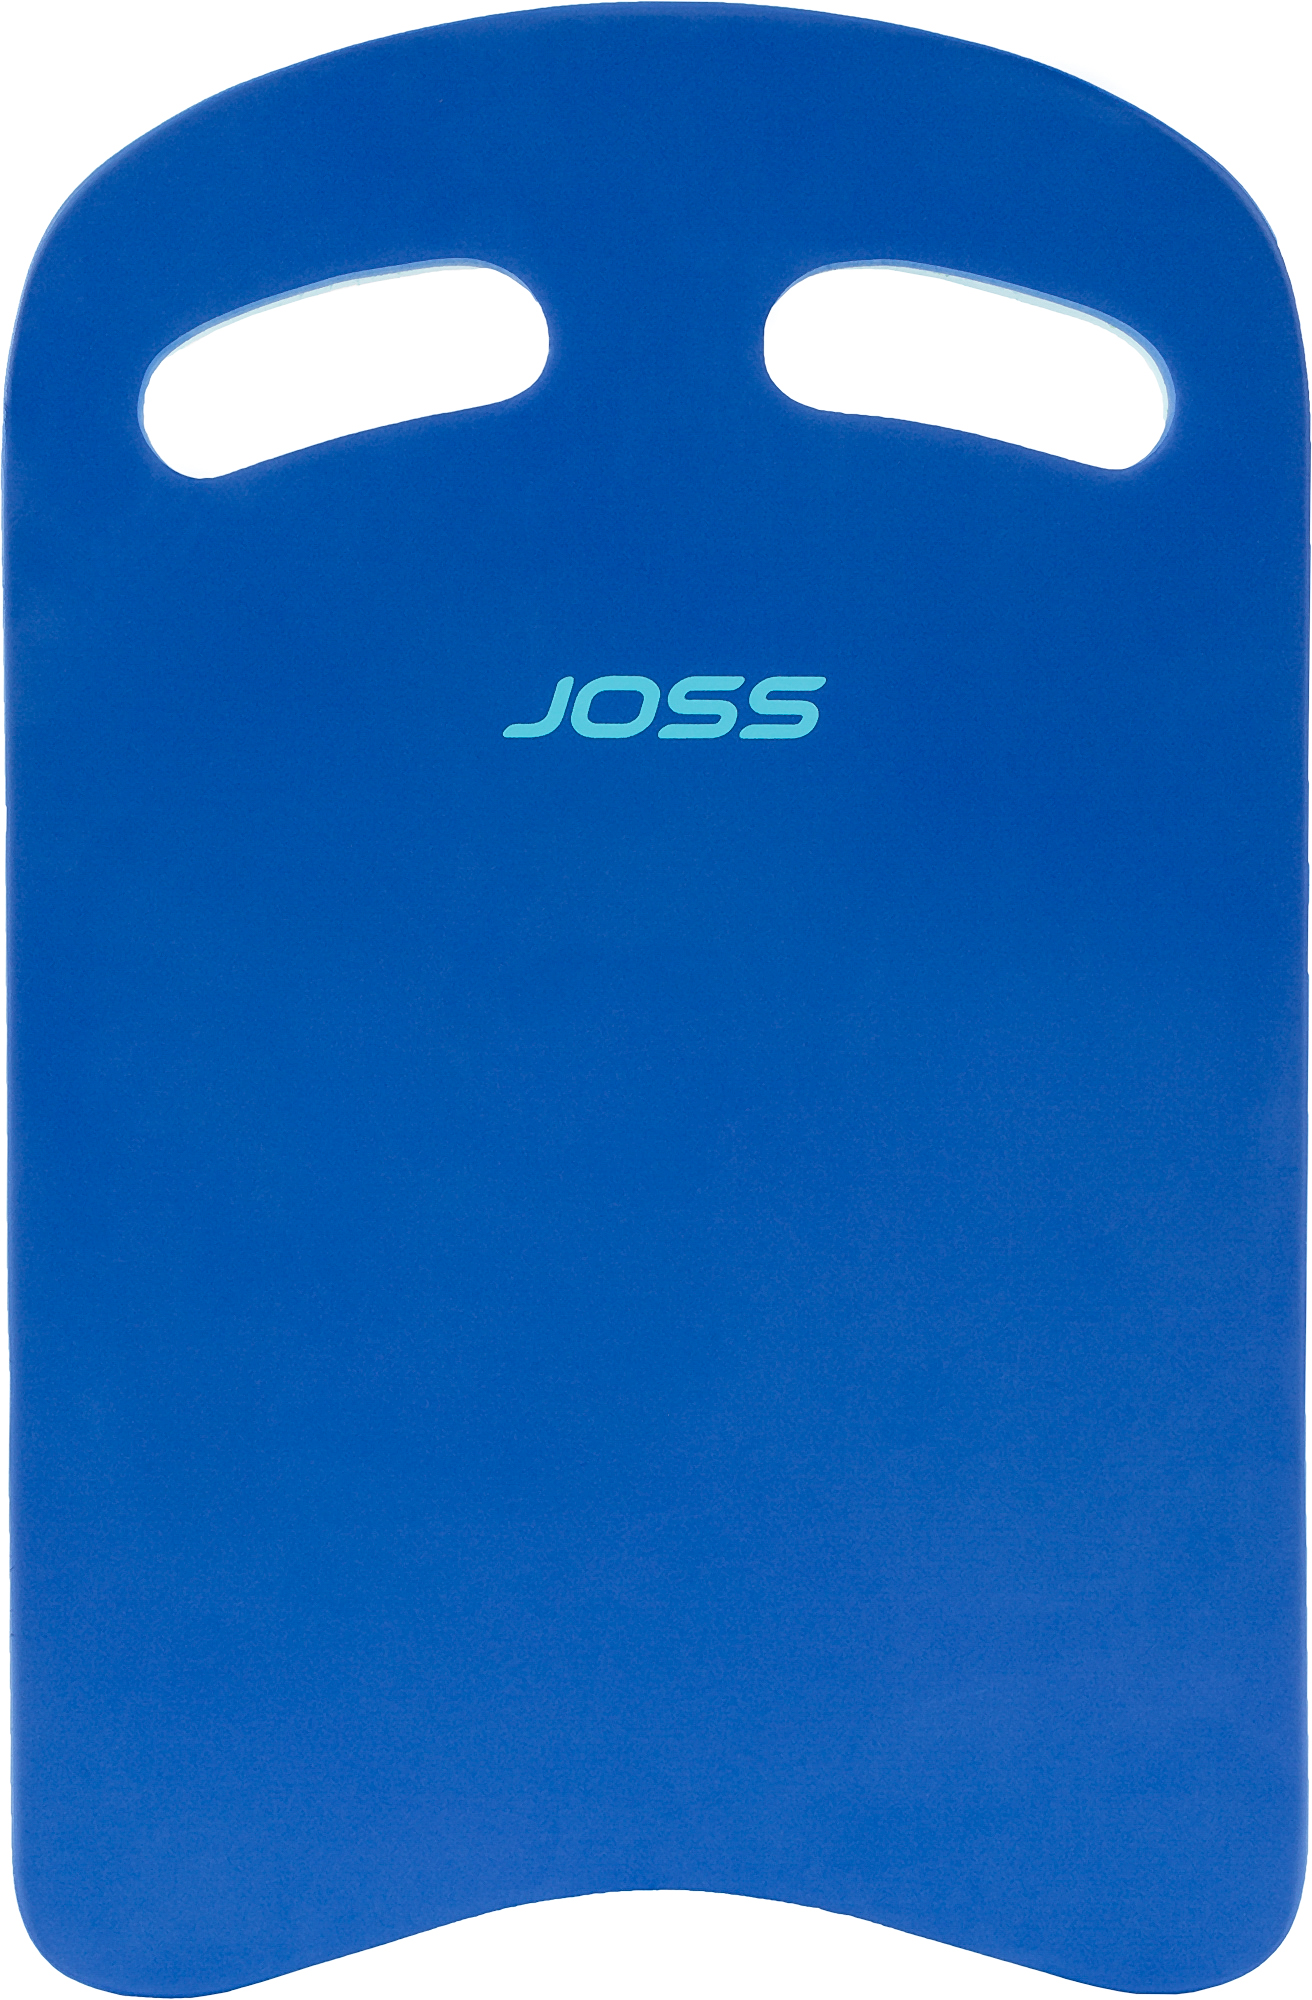 Joss Доска для плавания Joss цена